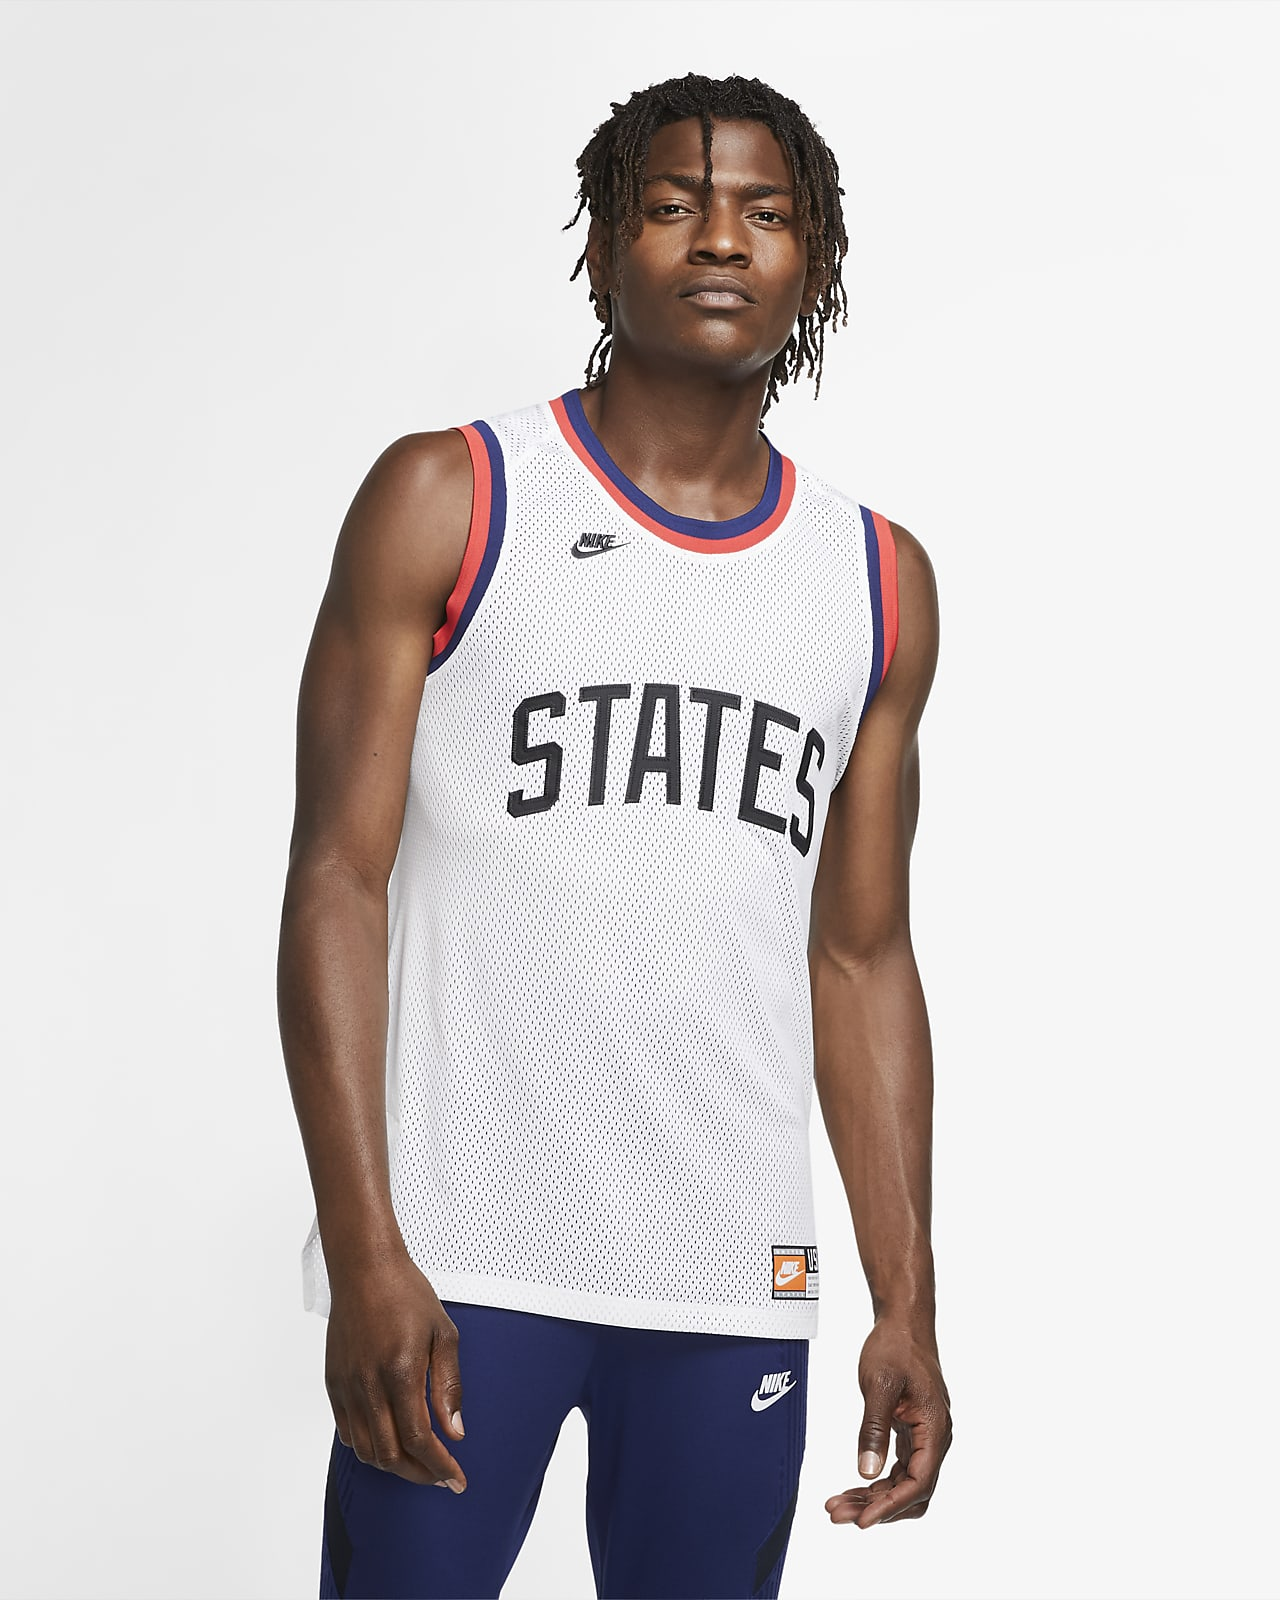 U.S. Men's Basketball Top